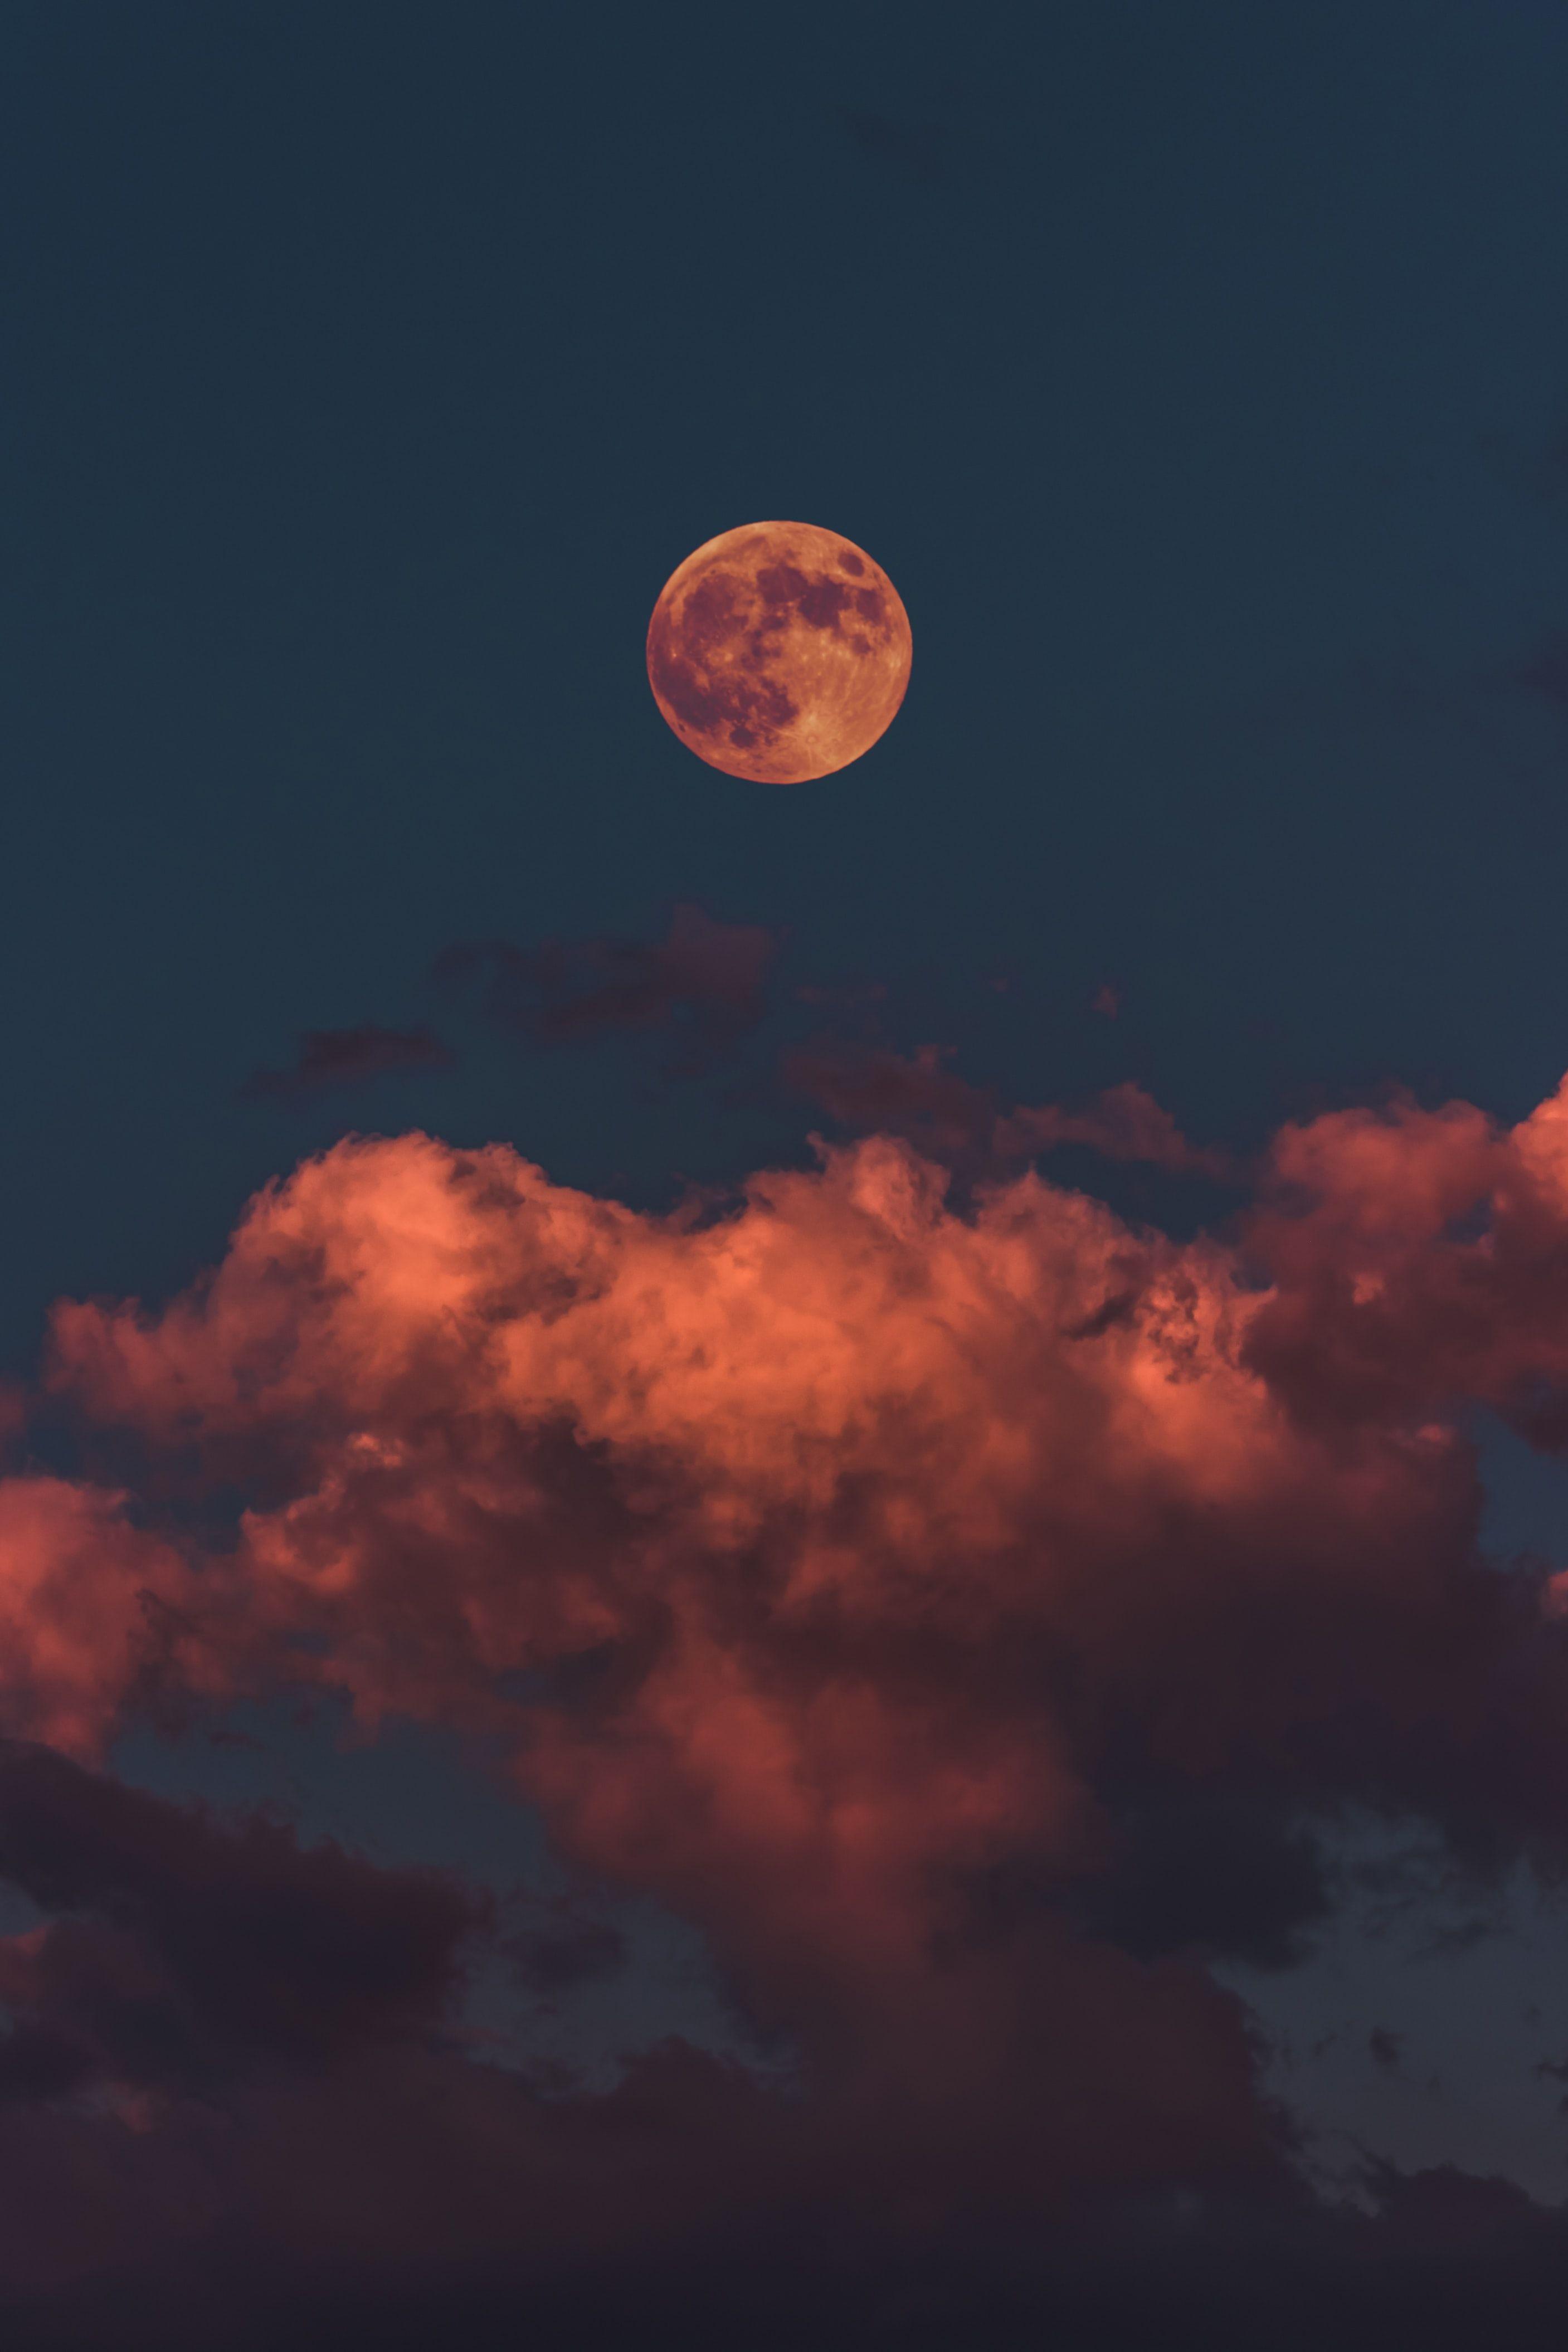 Full Moon Wallpapers   21k, HD Full Moon Backgrounds on WallpaperBat